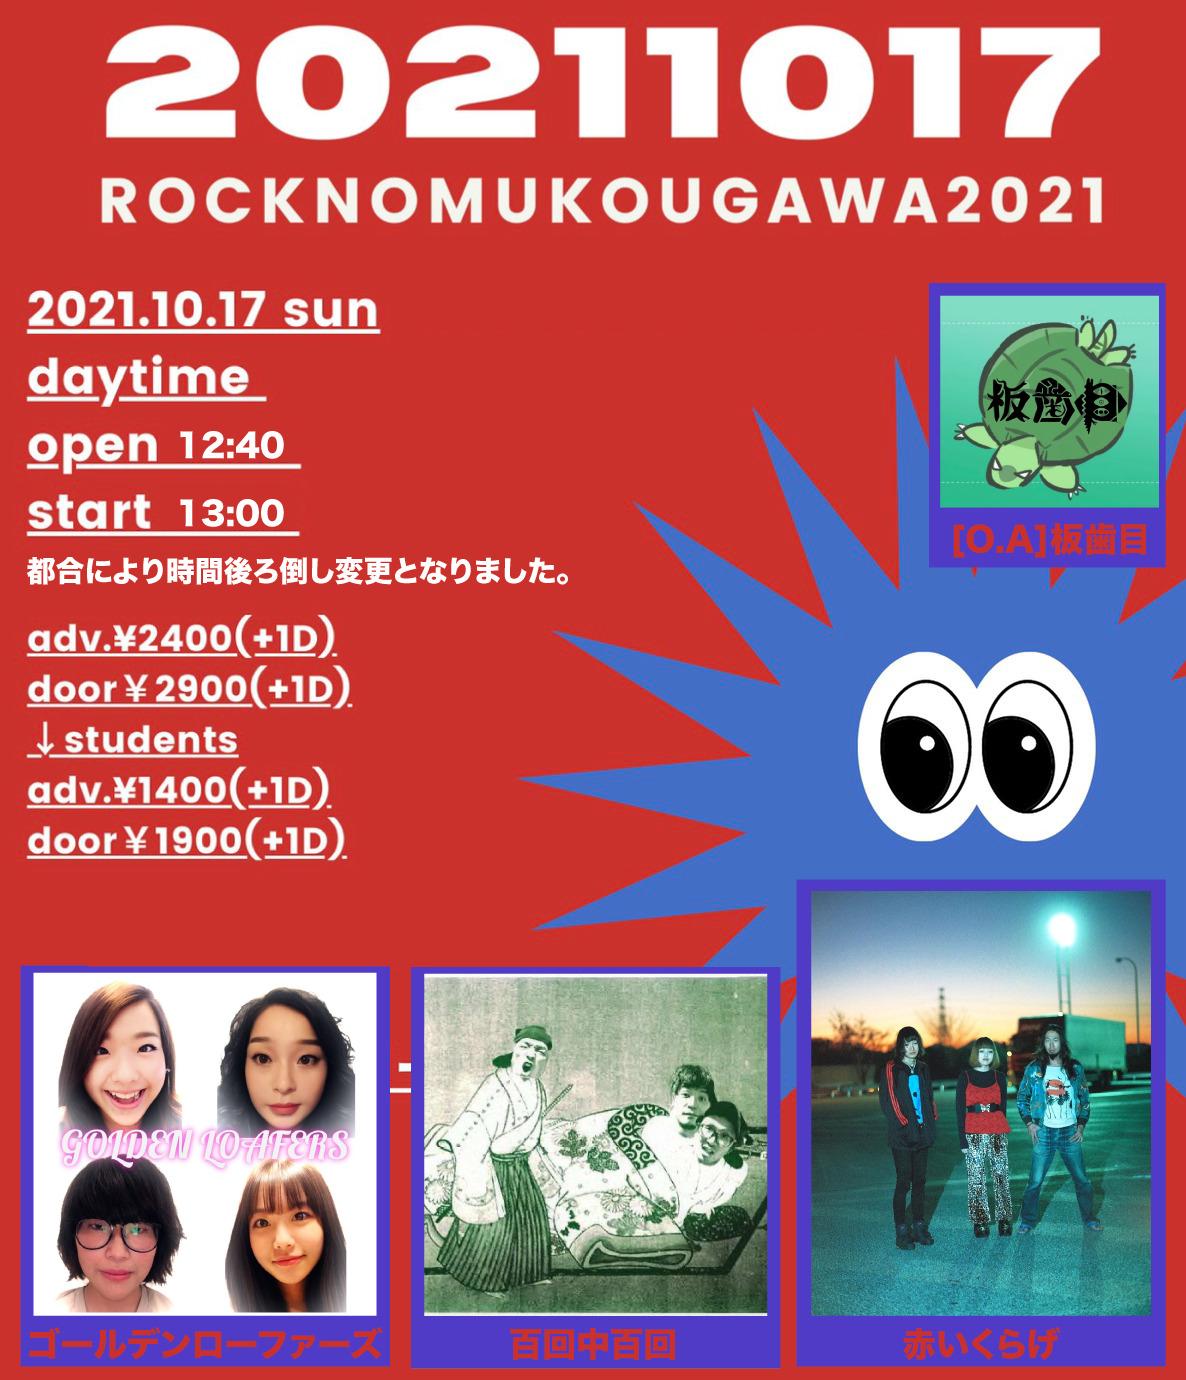 ROCKNOMUKOUGAWA2021-Marble INDEPENDENCE 1st ANNIVERSARY-